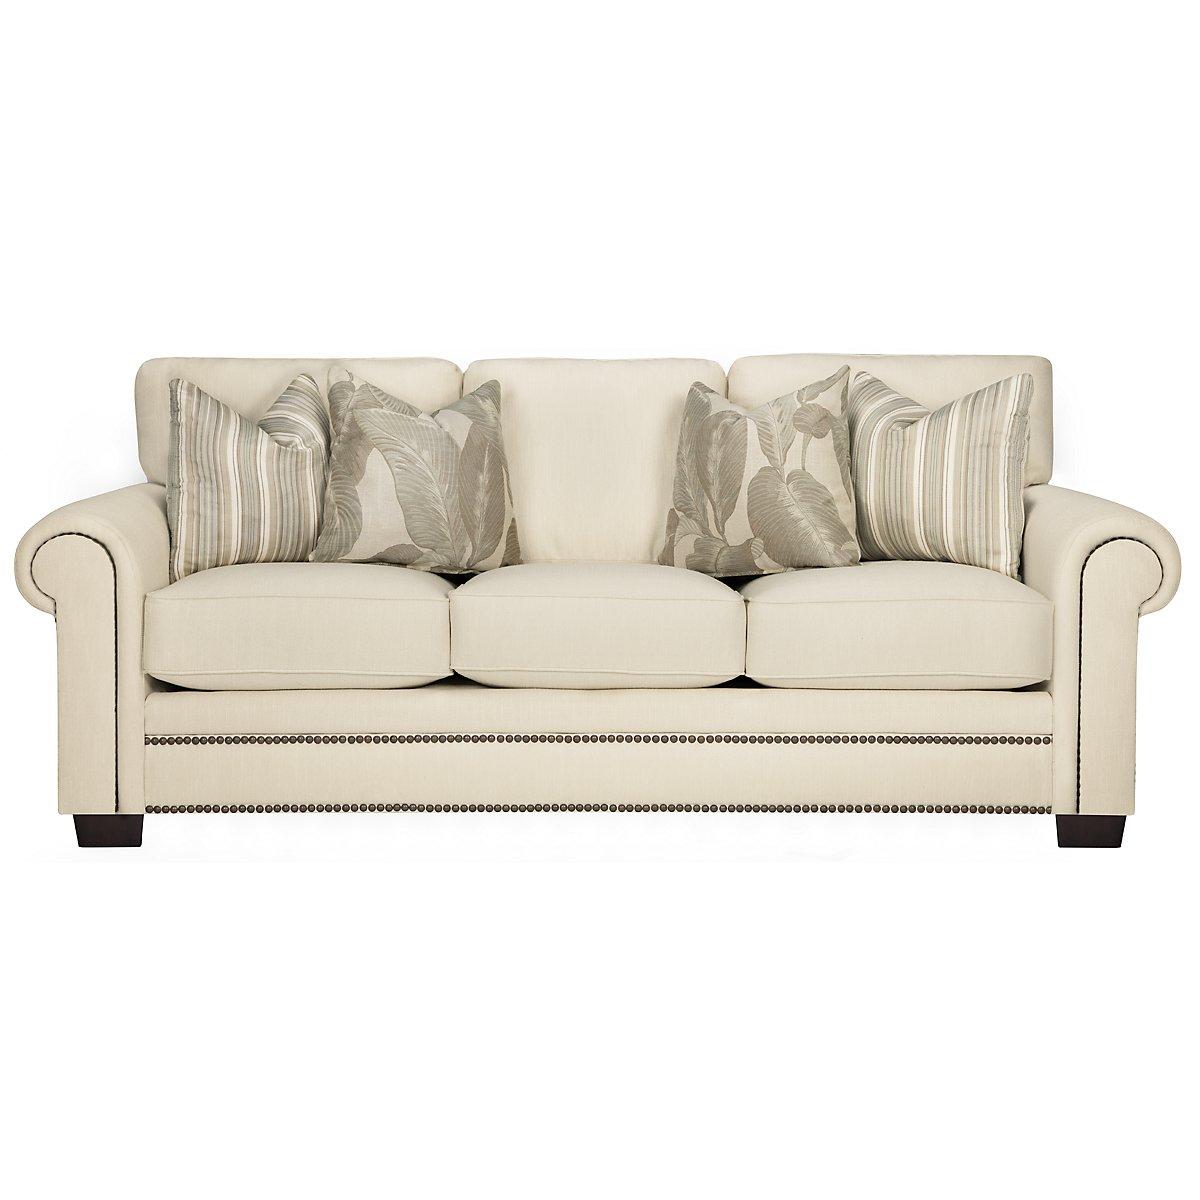 Erin White Fabric Sofa